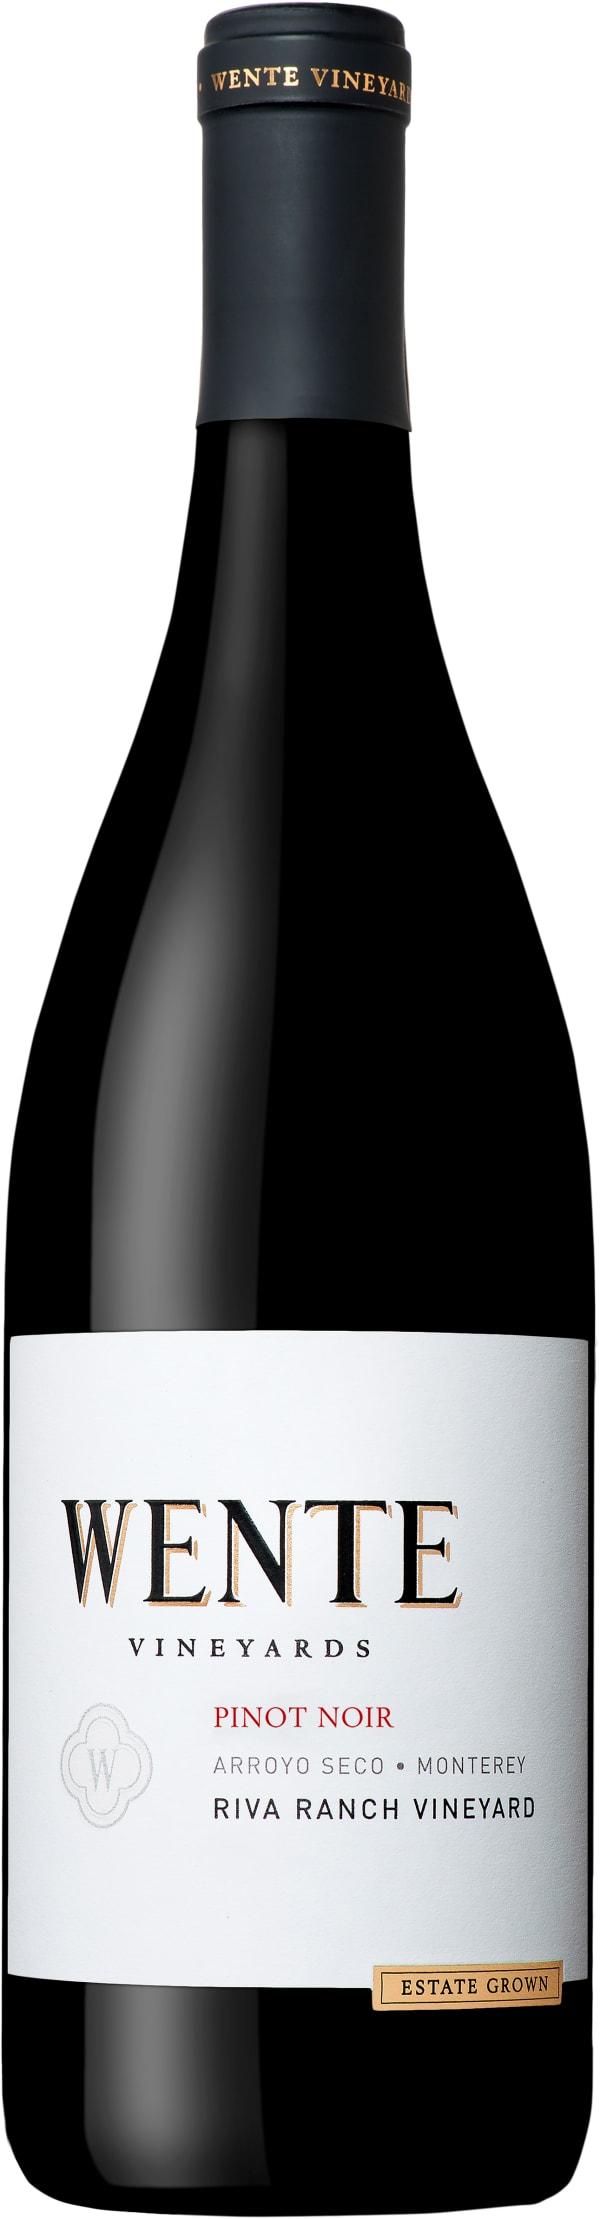 Wente Riva Ranch Pinot Noir 2017